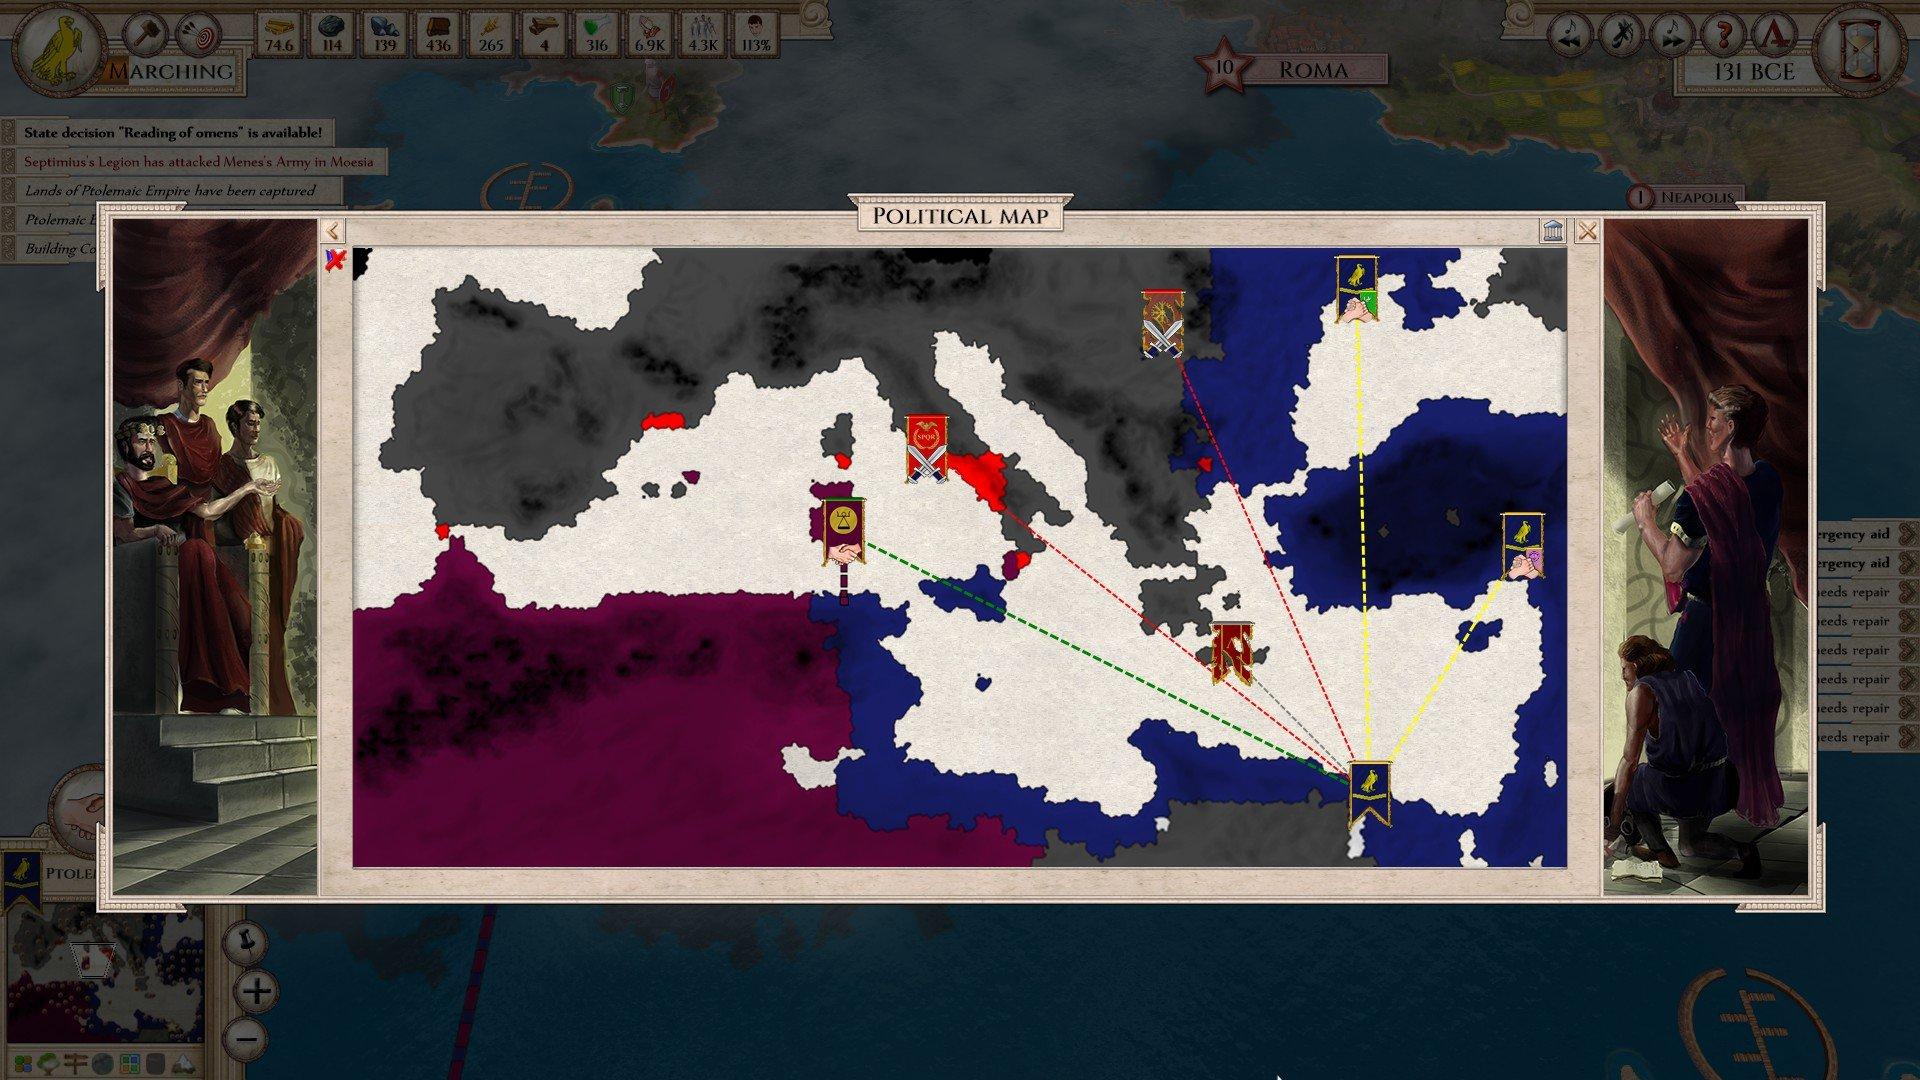 Political Map - Aggressors: Ancient Rome (Illustration